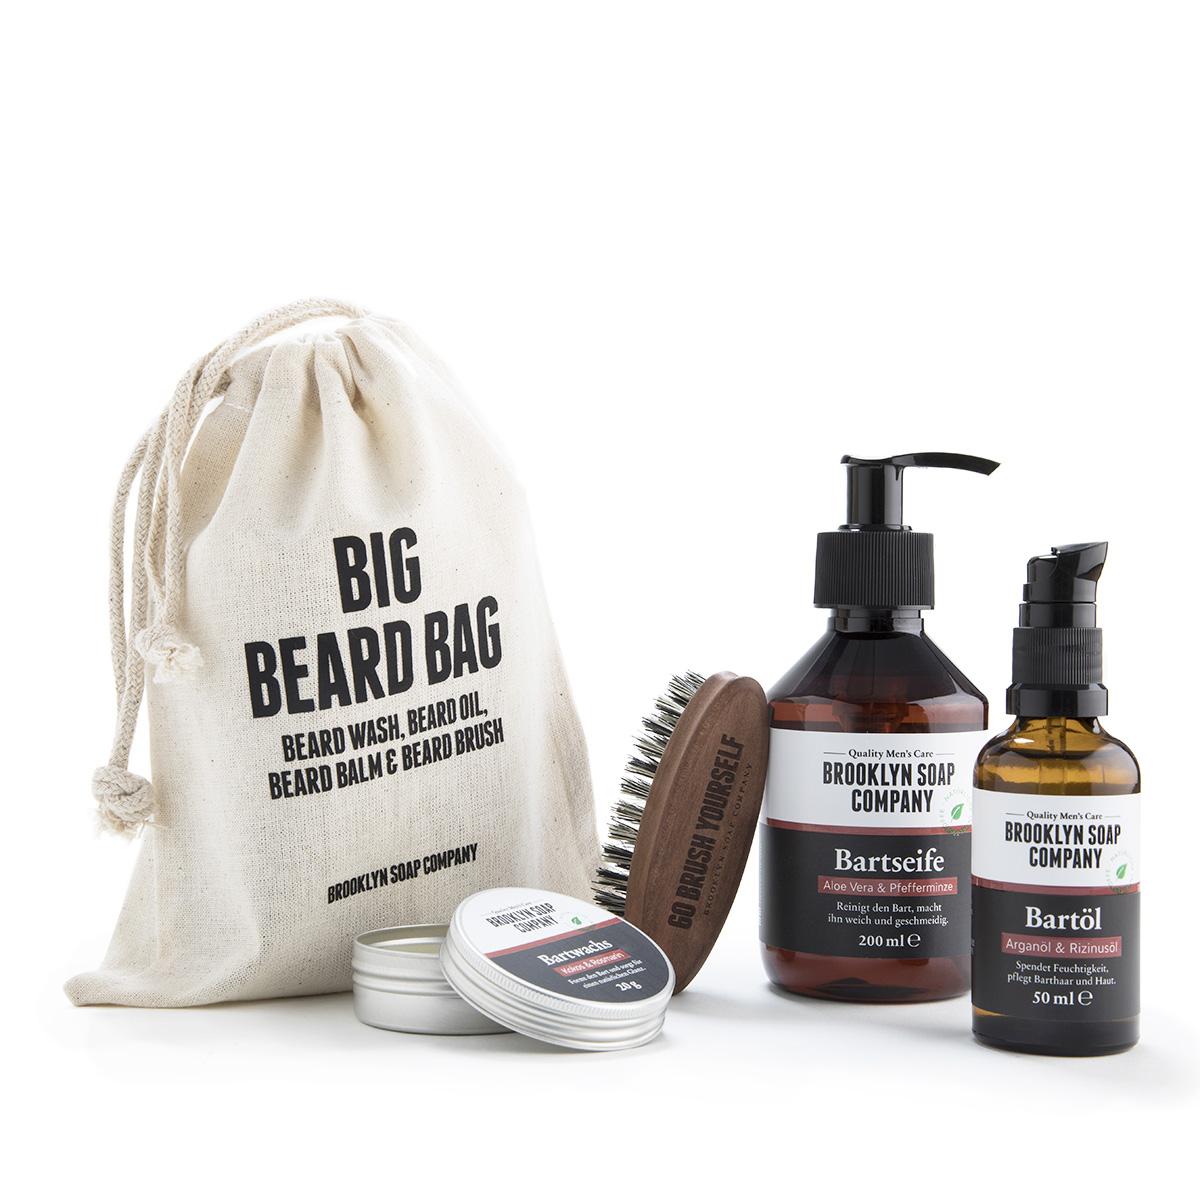 Big Beard Bag